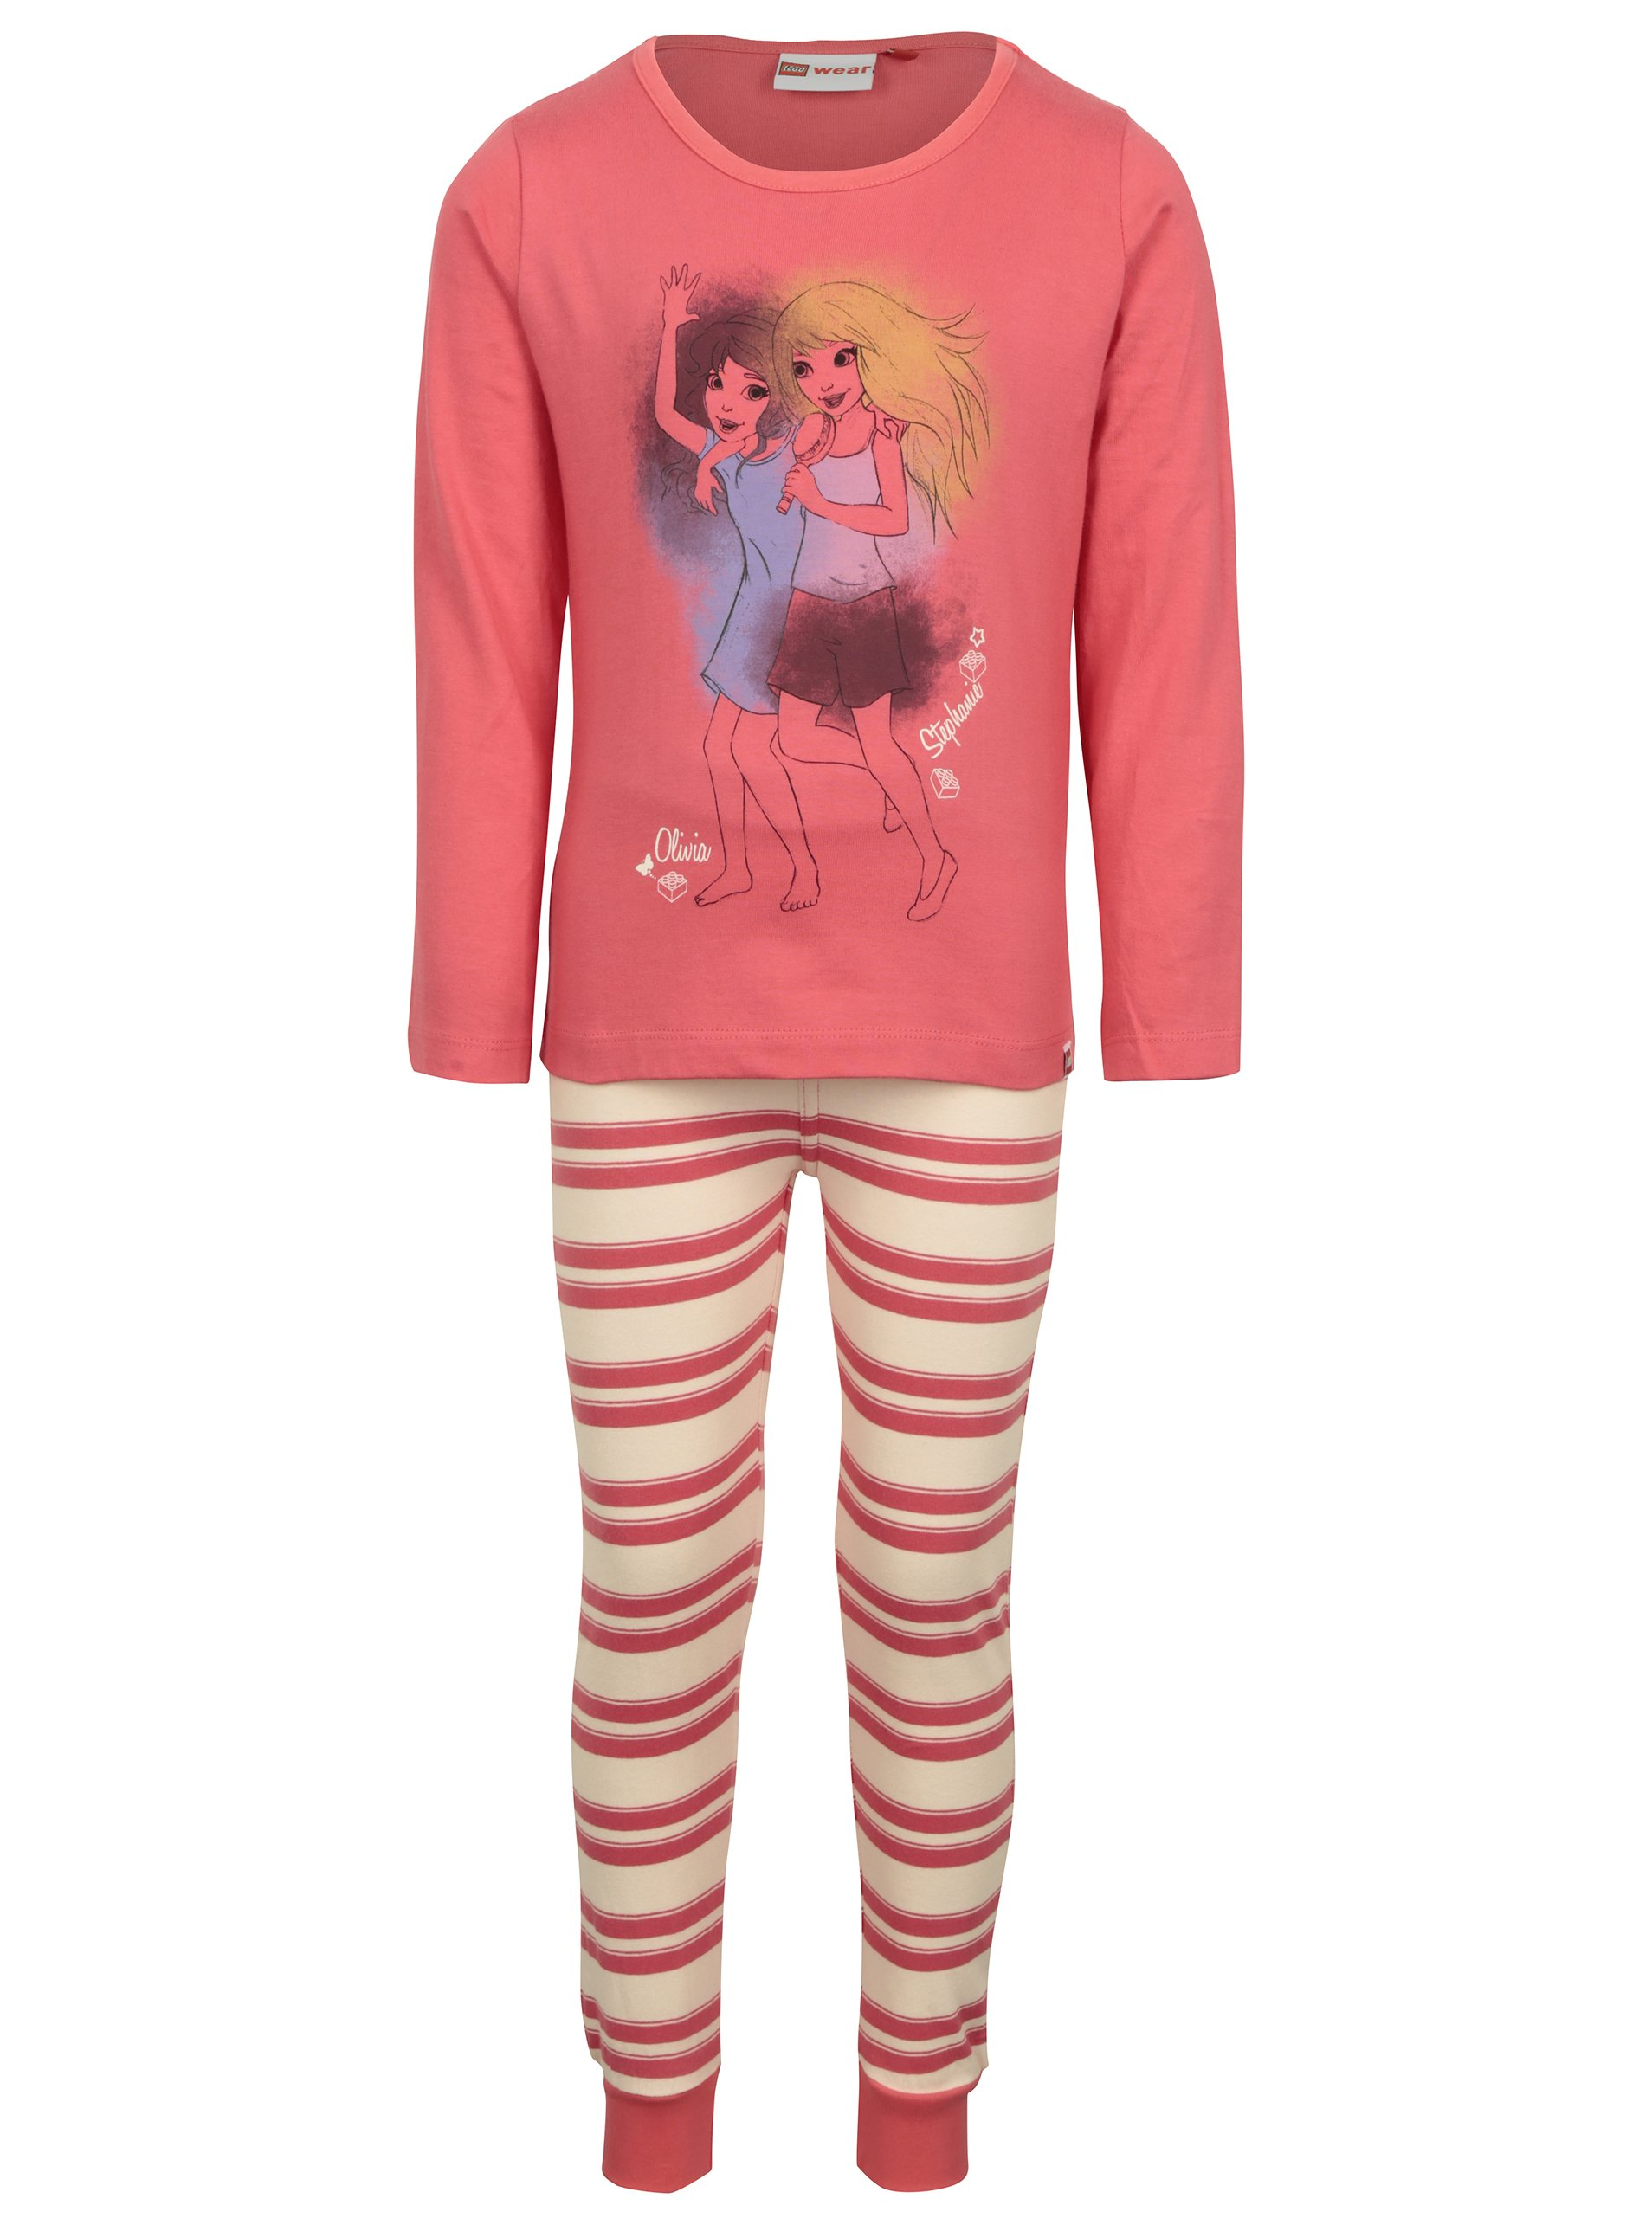 Růžové holčičí pyžamo s potiskem Lego Wear Nevada